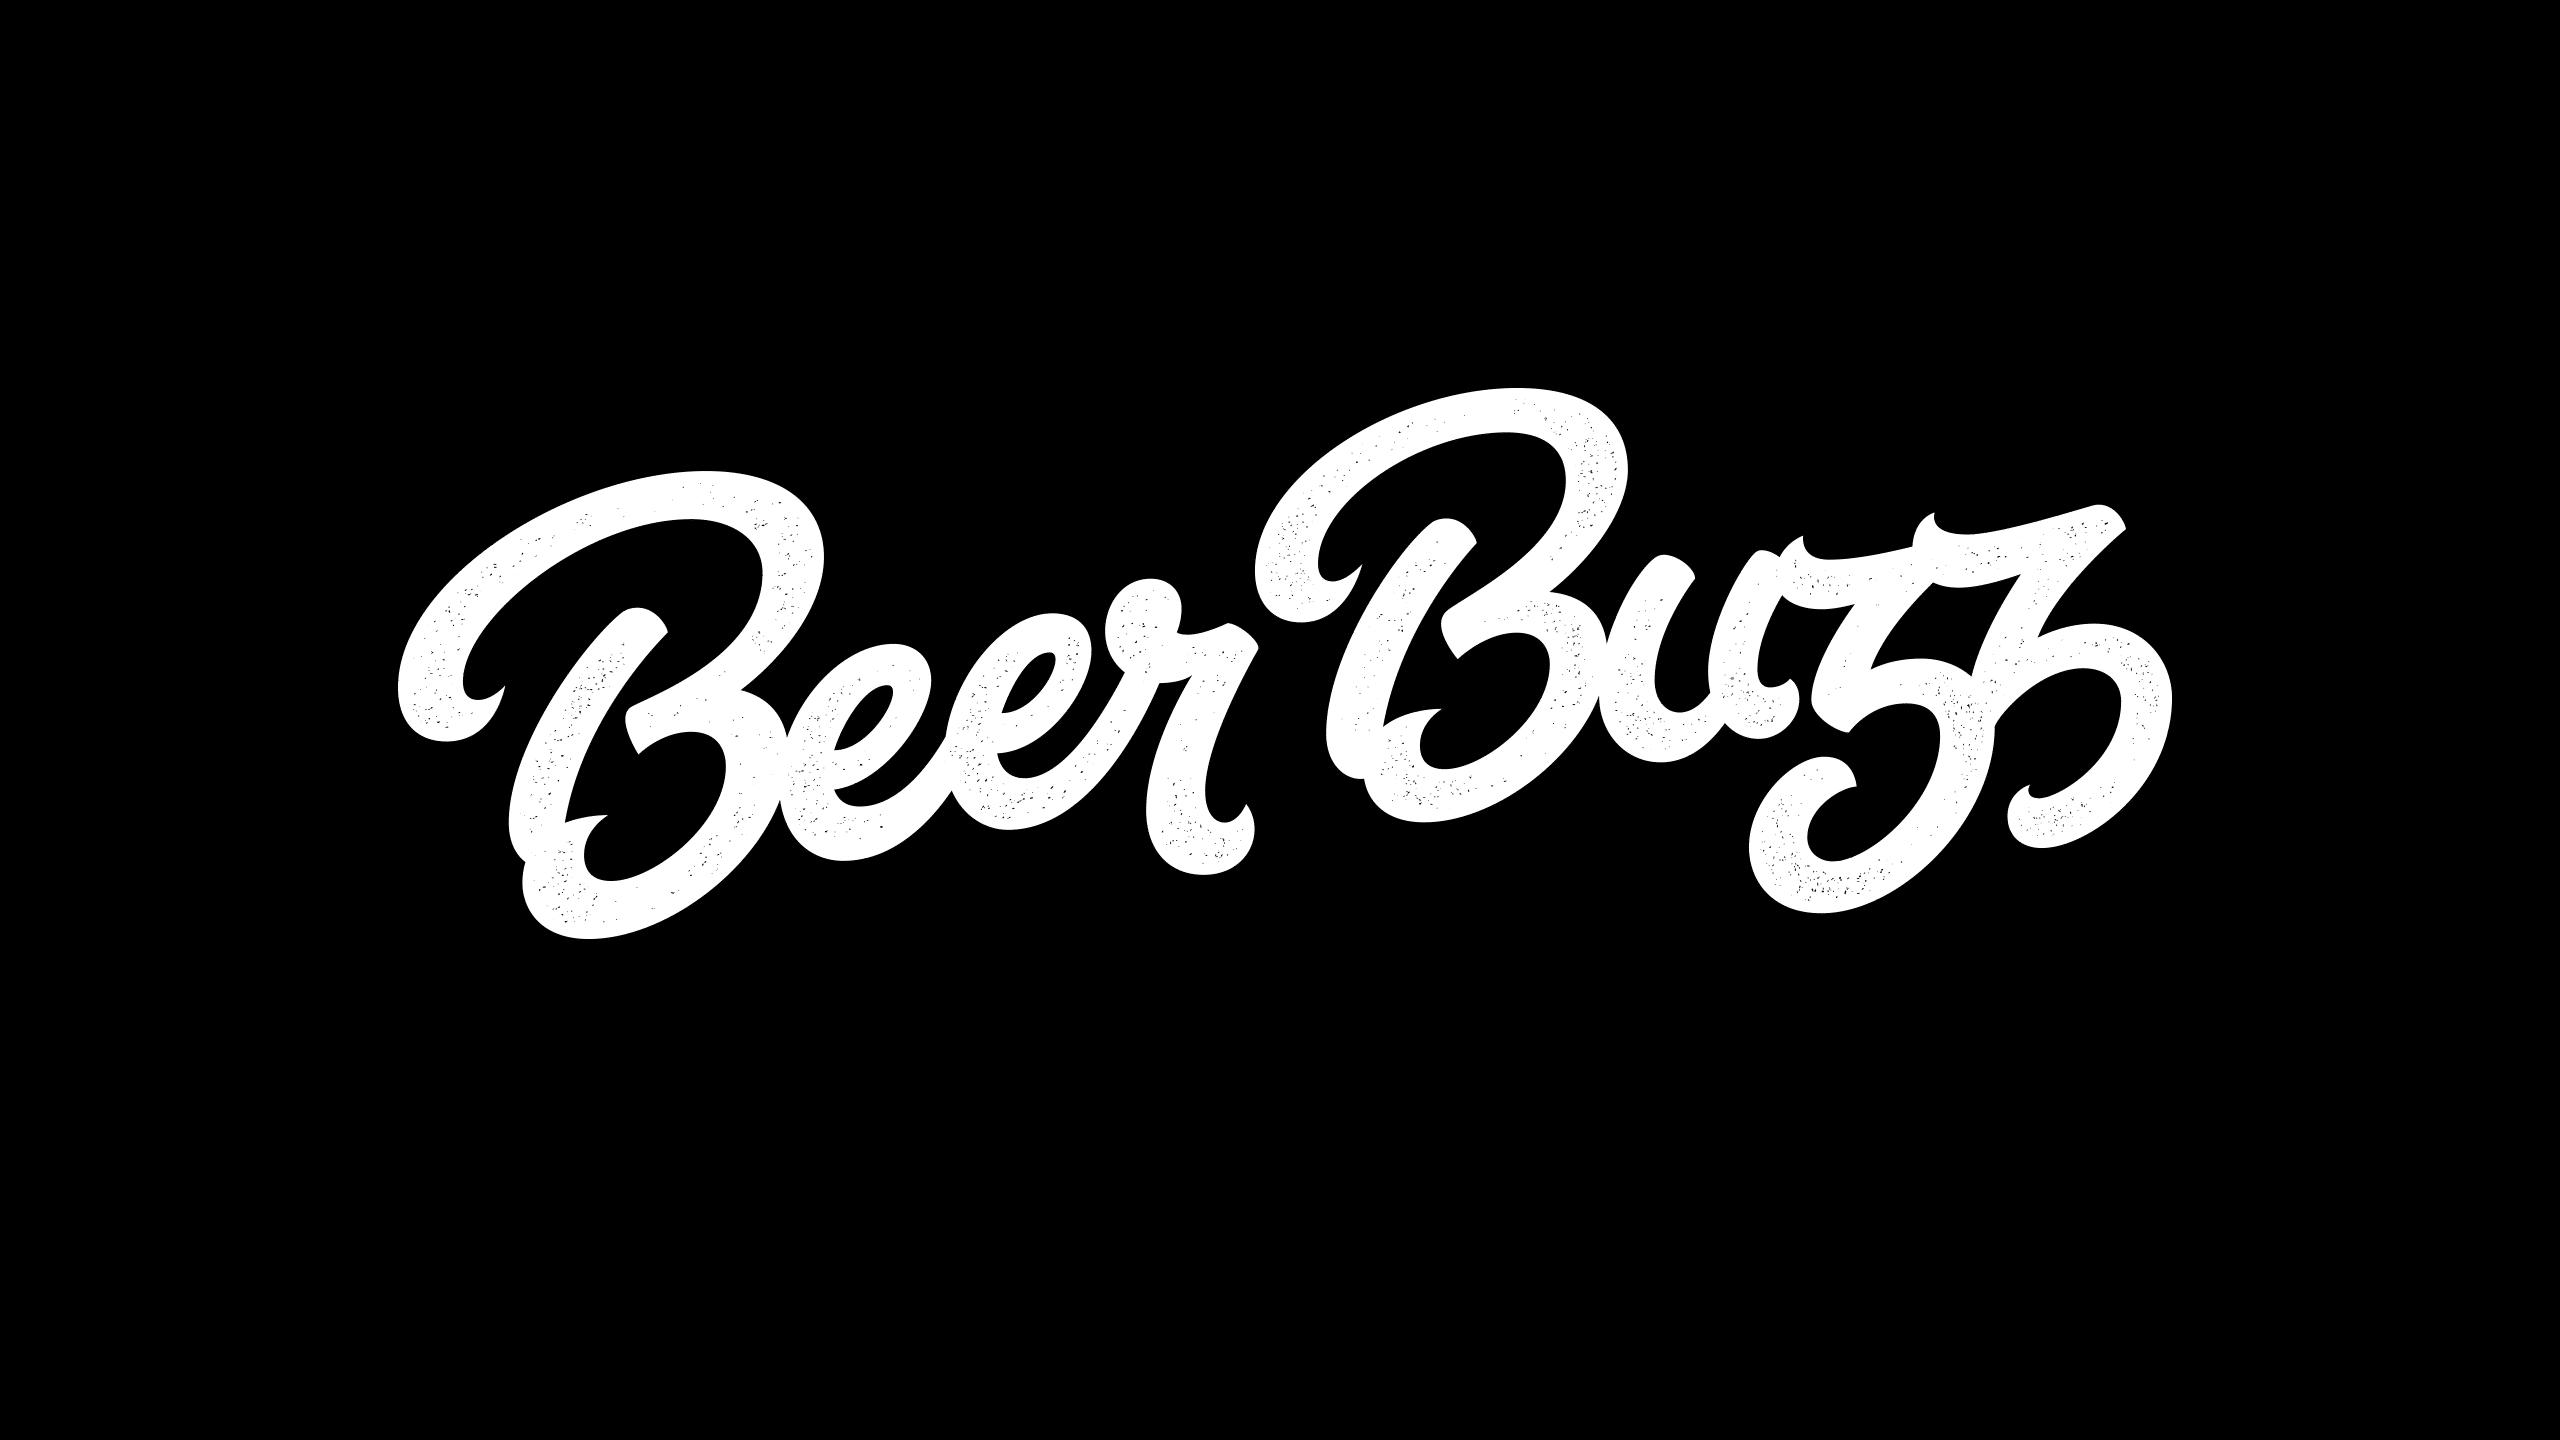 Final Beer Buzz logo.